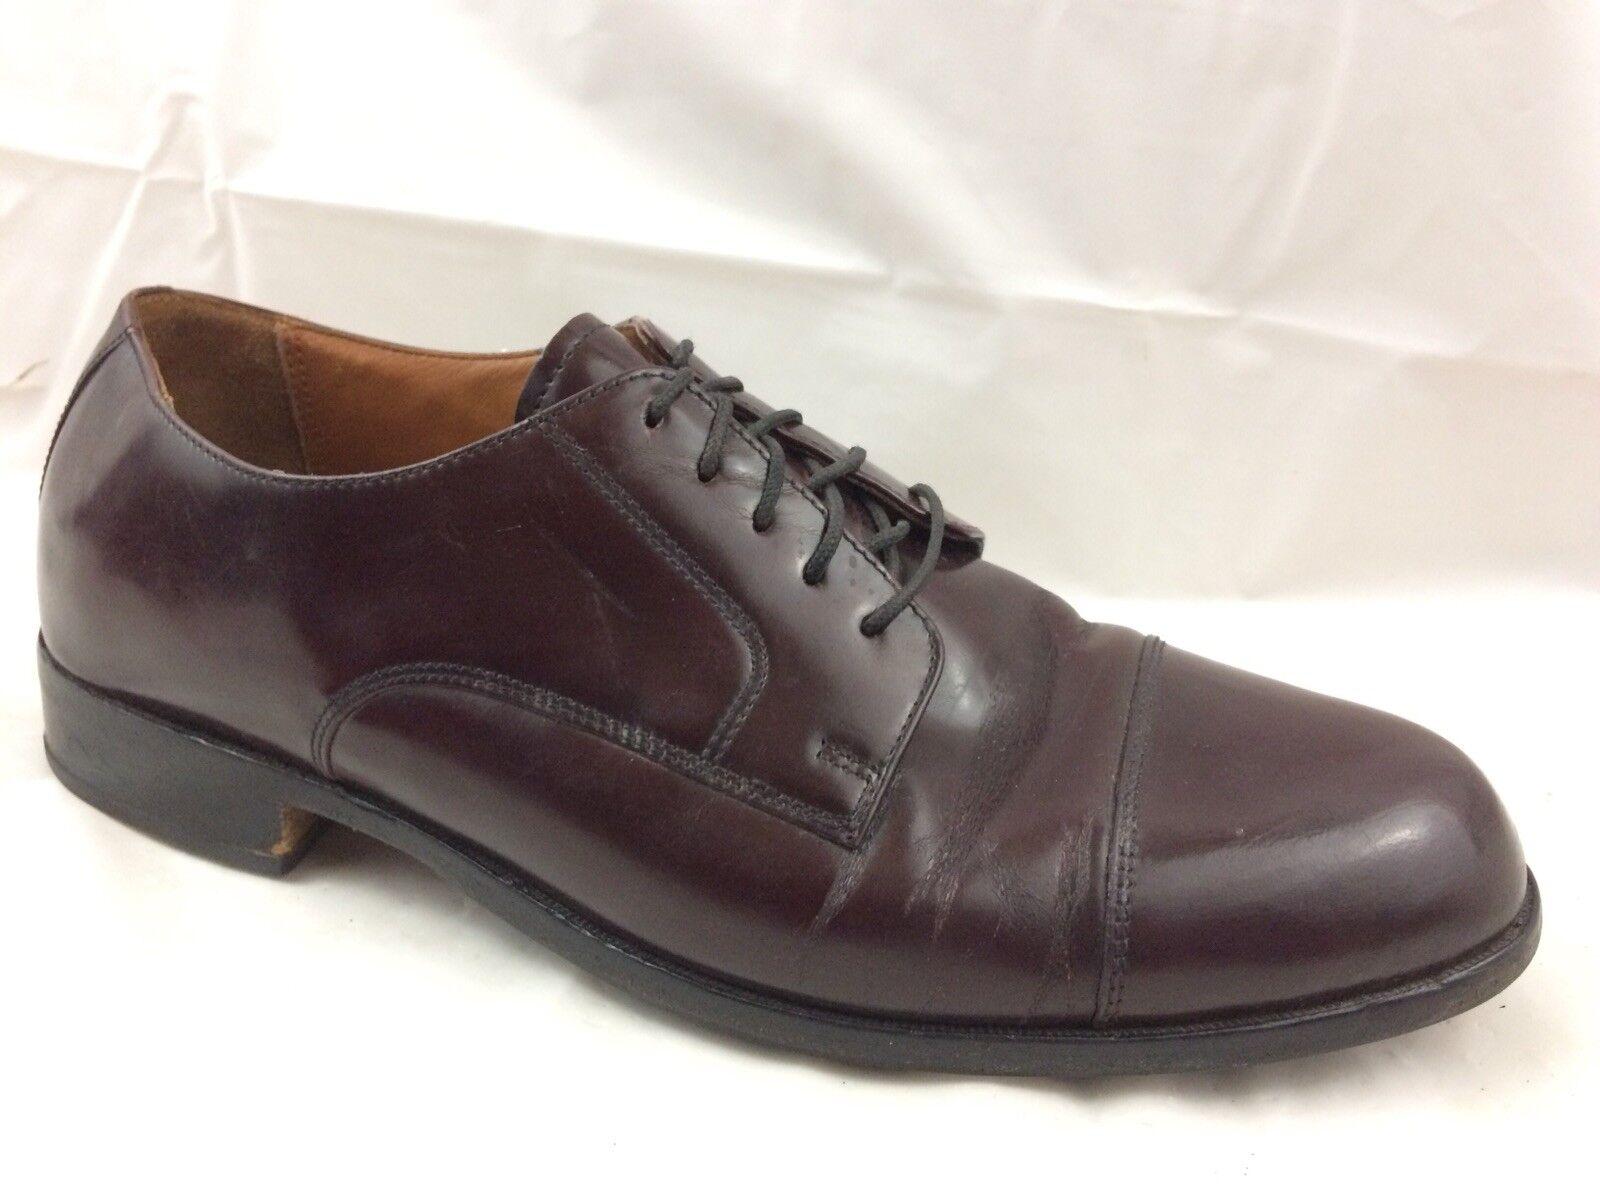 Bostonian Classics 20398 First Flex Men 9.5 M Dress shoes Burgundy Leather Vibram